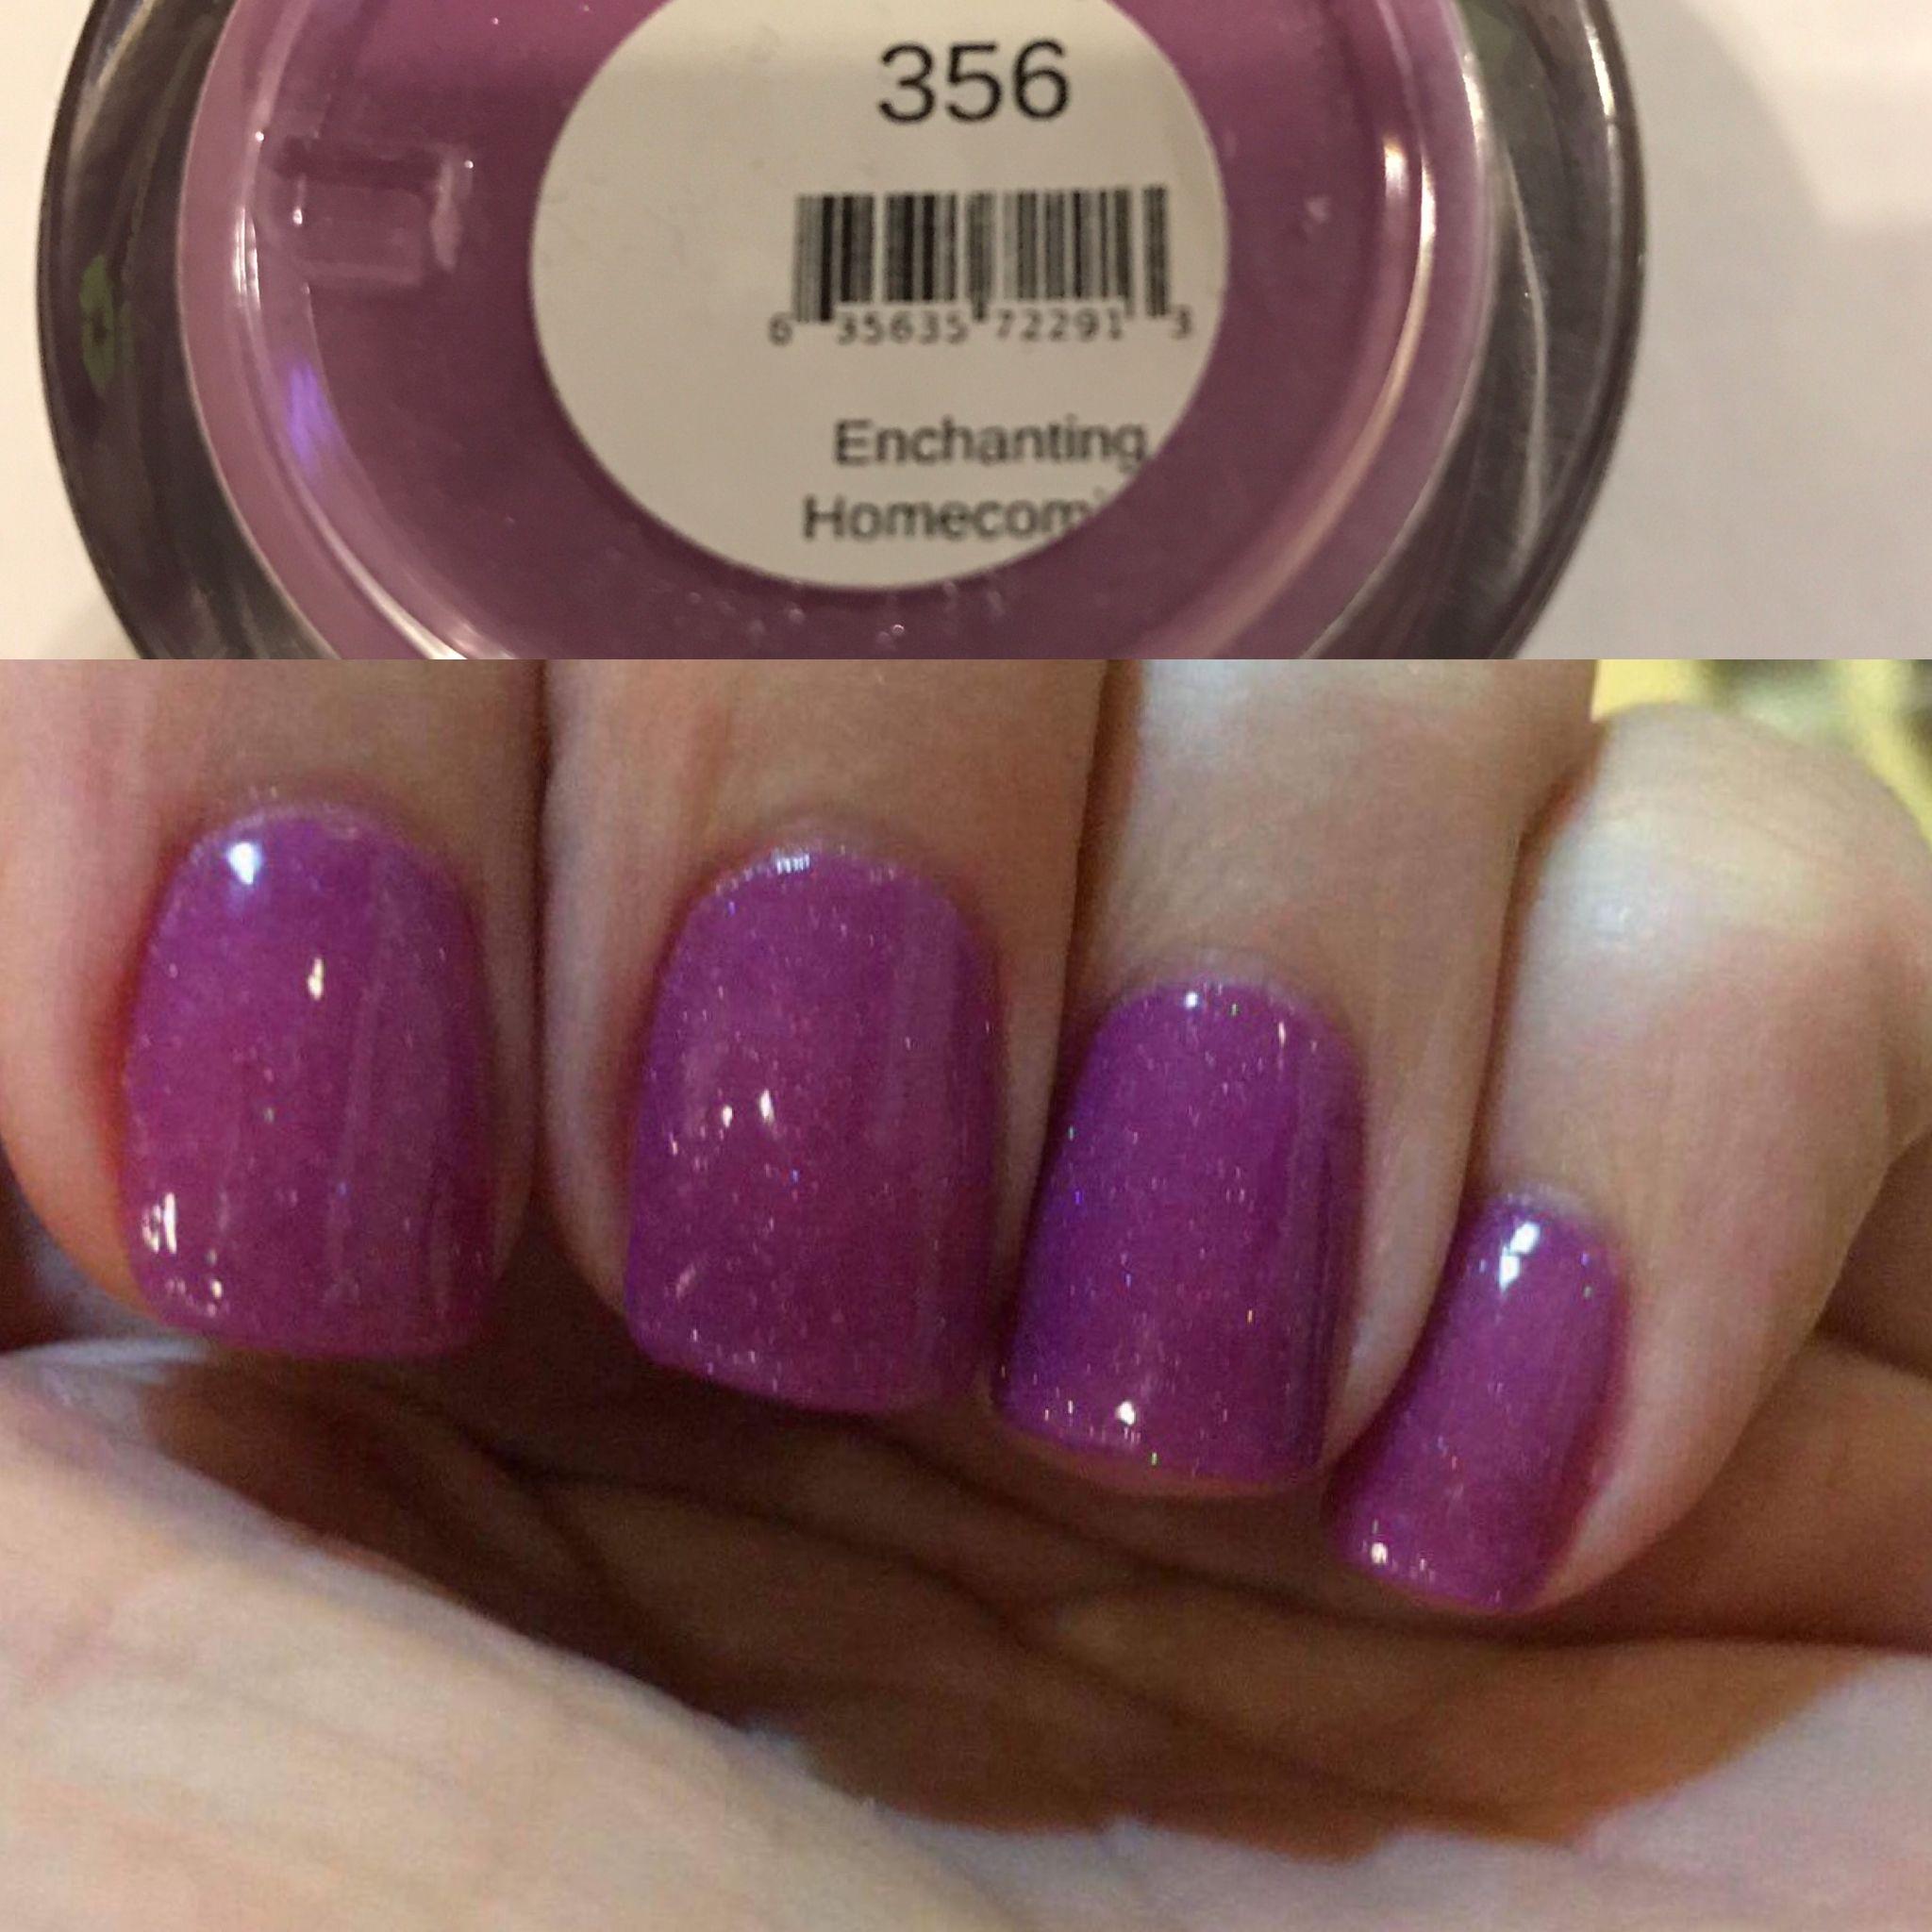 Pin by Jenn Gl0ver on Hair, Nails & Beauty   Pinterest   Sns nails ...